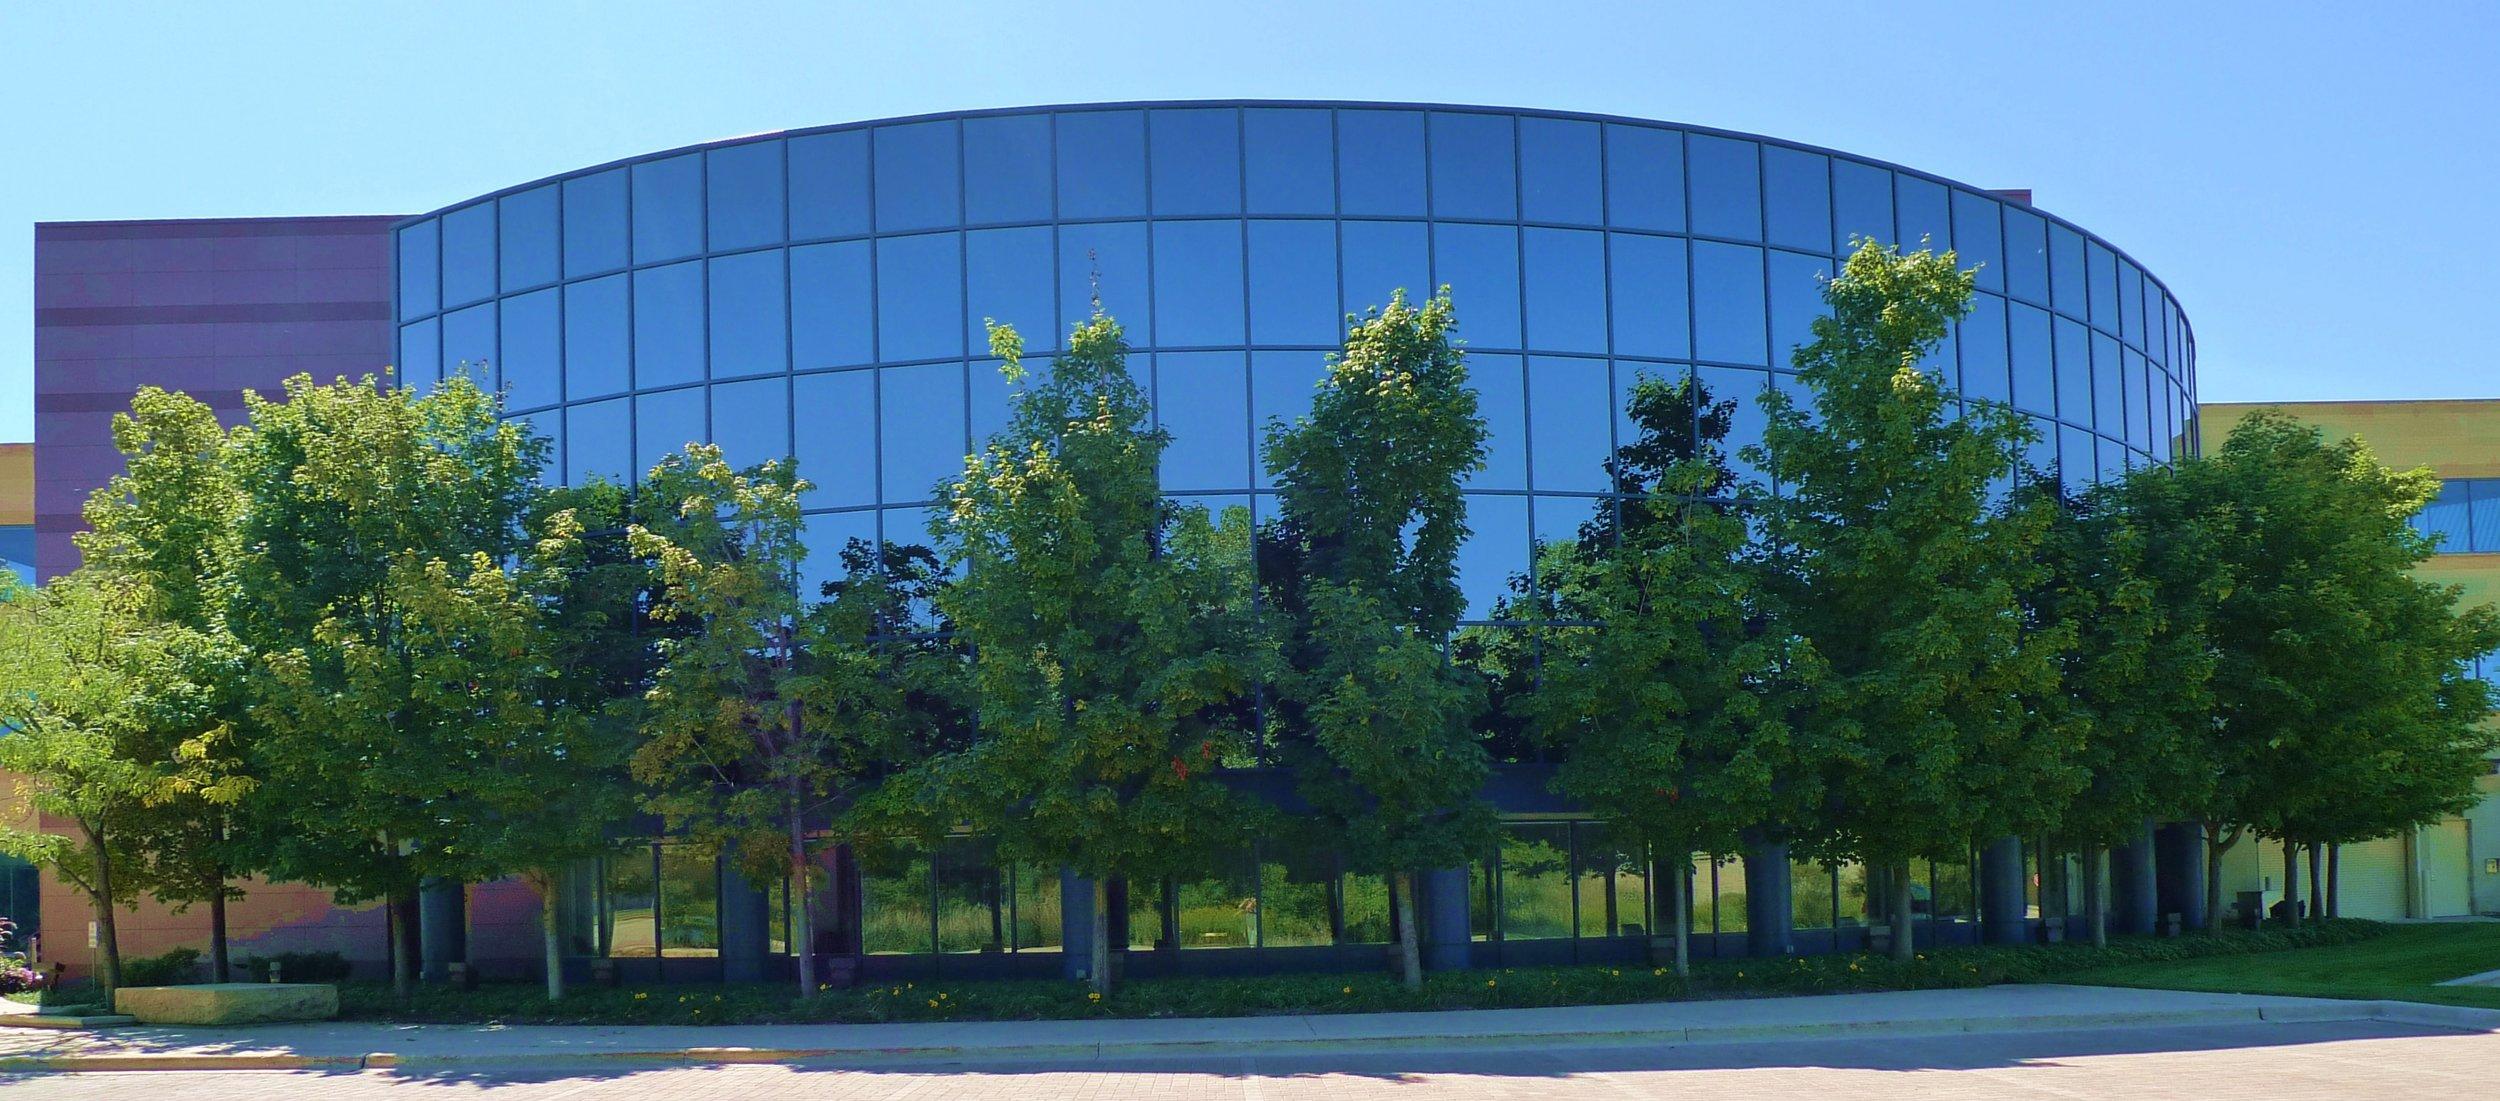 Headquarters - KeyAssets Financial, LLC600 N. Buffalo Grove Road, Suite 203Buffalo Grove, Illinois 60089 USA847-465-7252